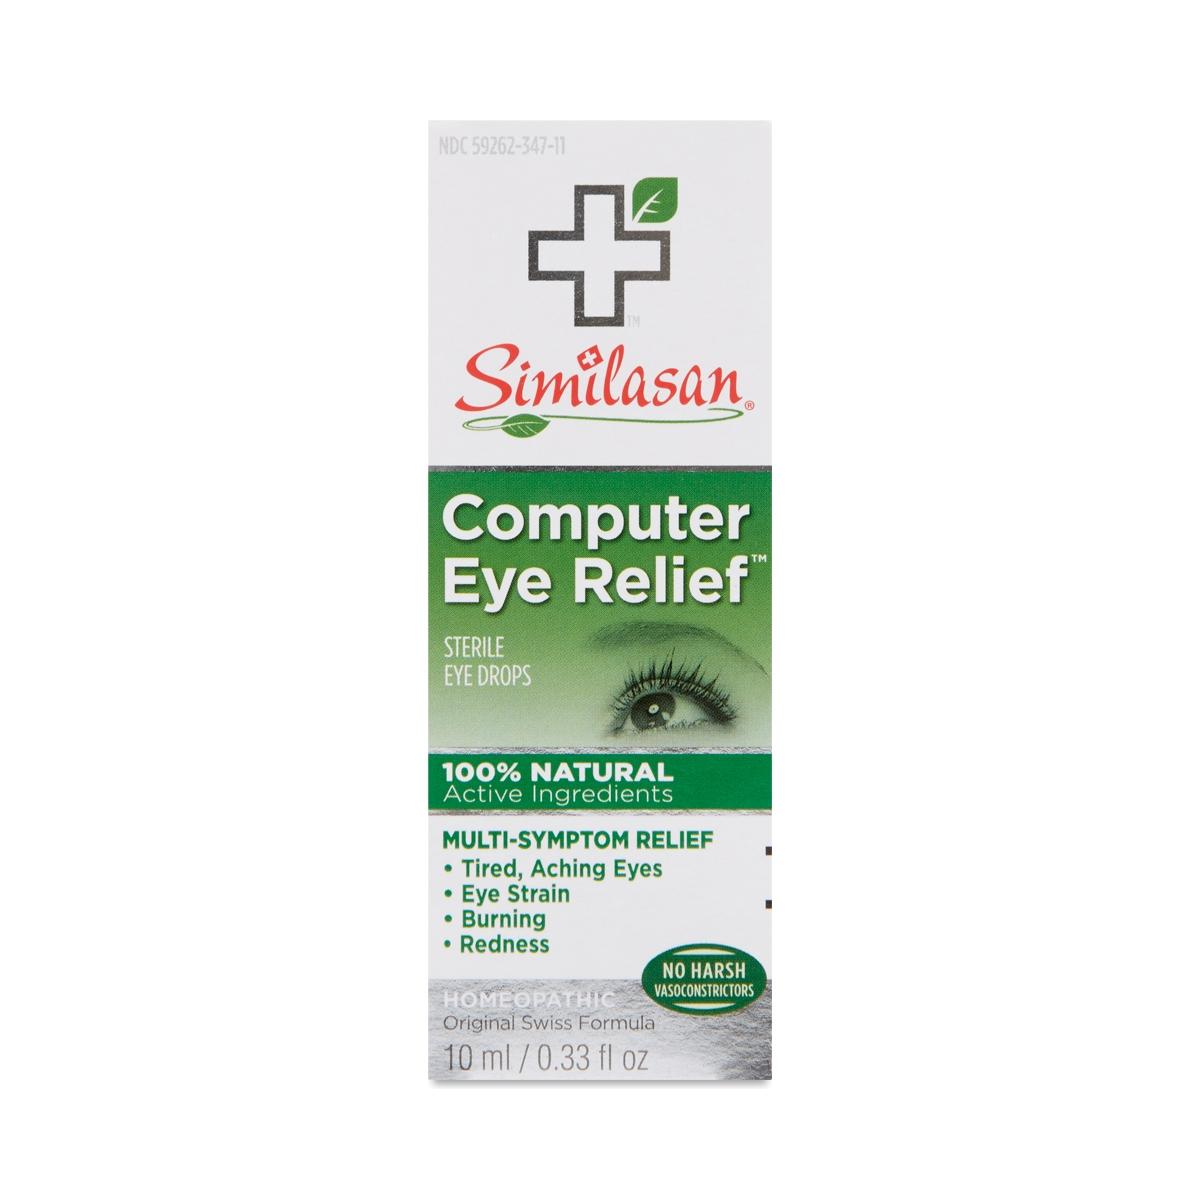 Similasan Corp Computer Eye Relief Drops 10 mL bottle